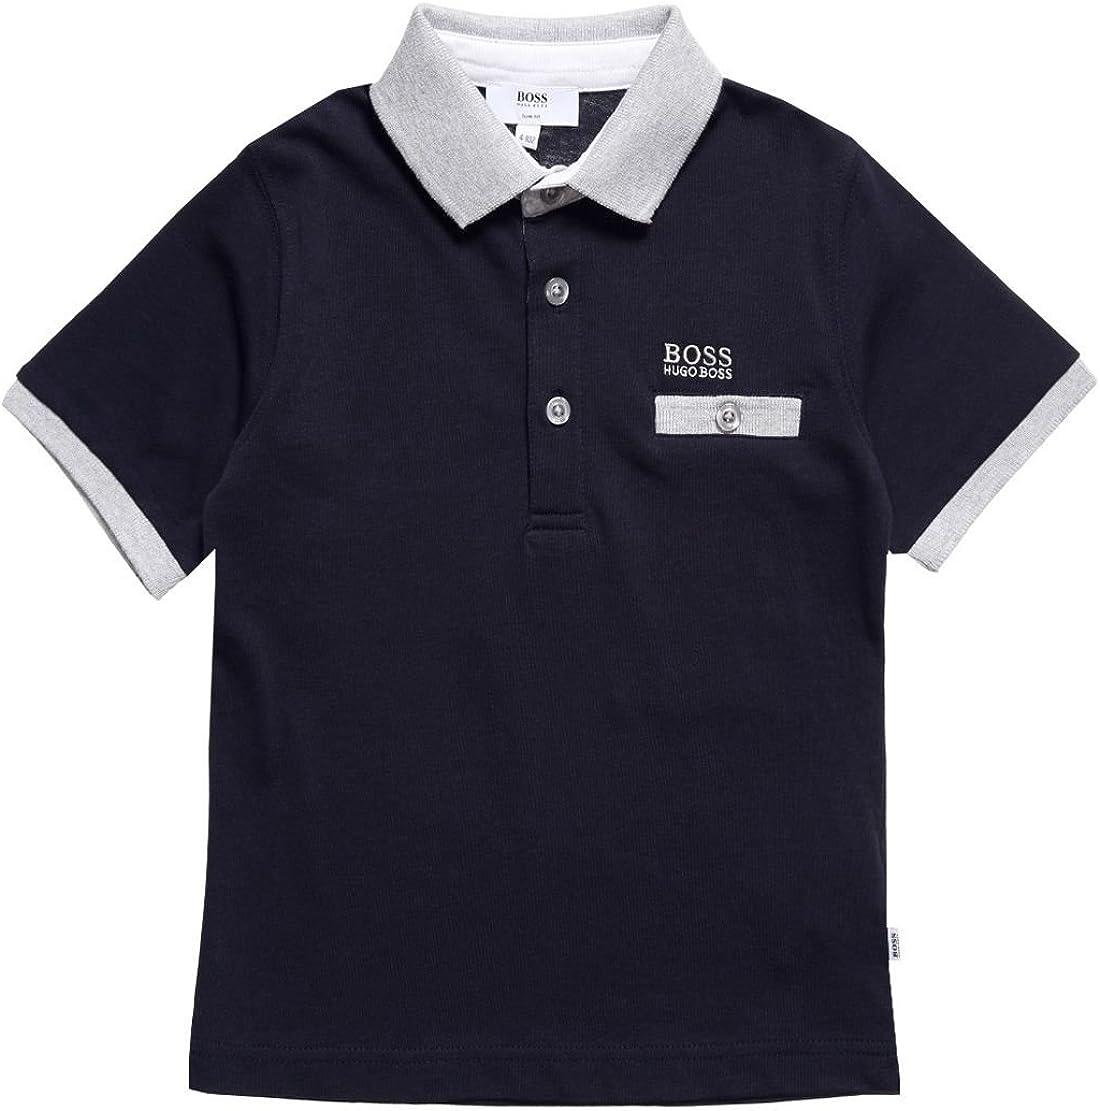 BOSS Jersey Polo